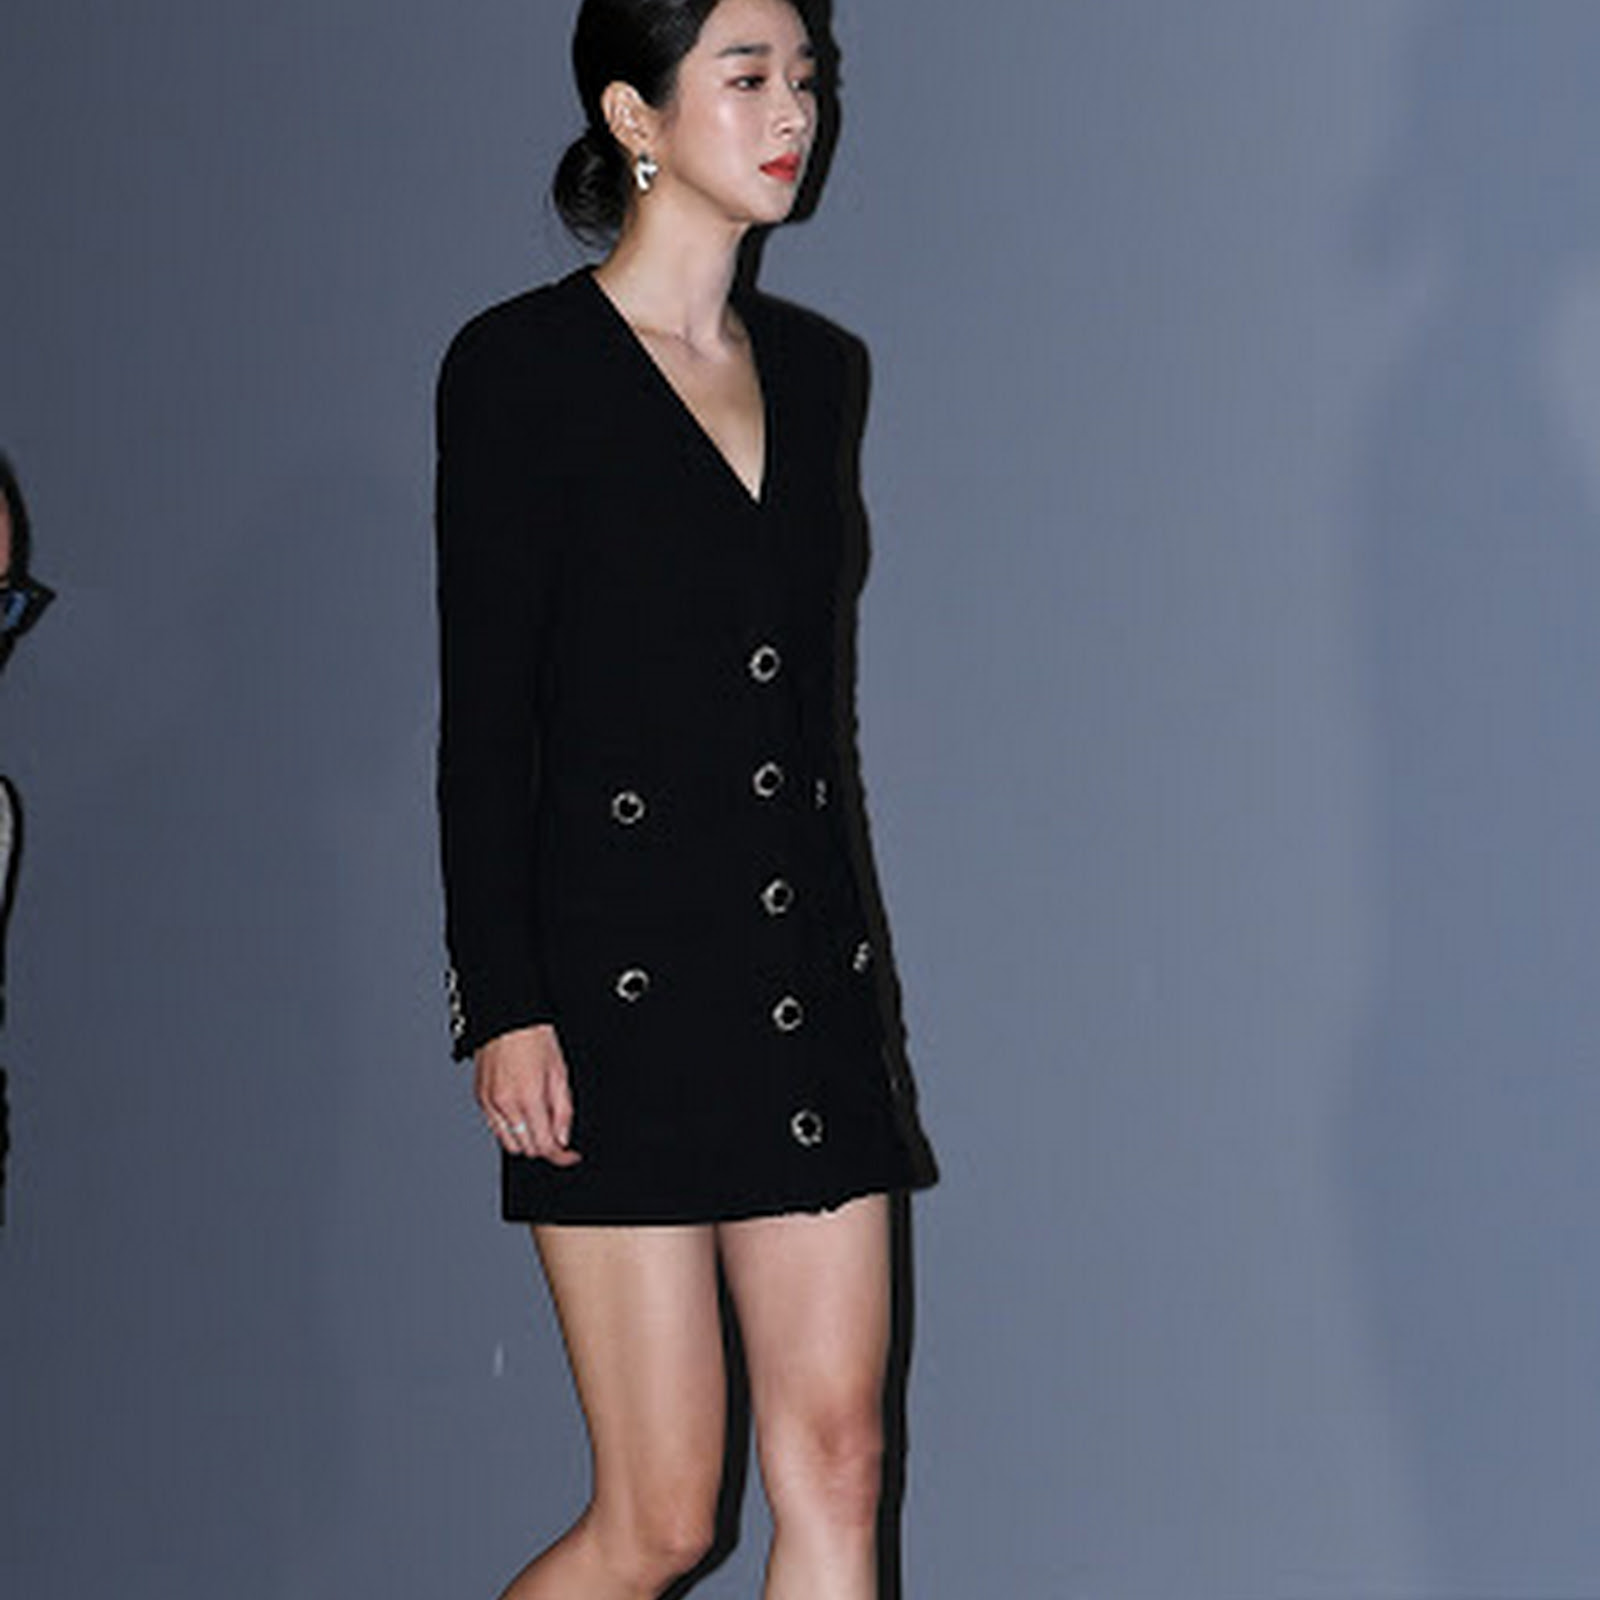 Seo Ye Ji Social Media - Seo Ye Ji Fans